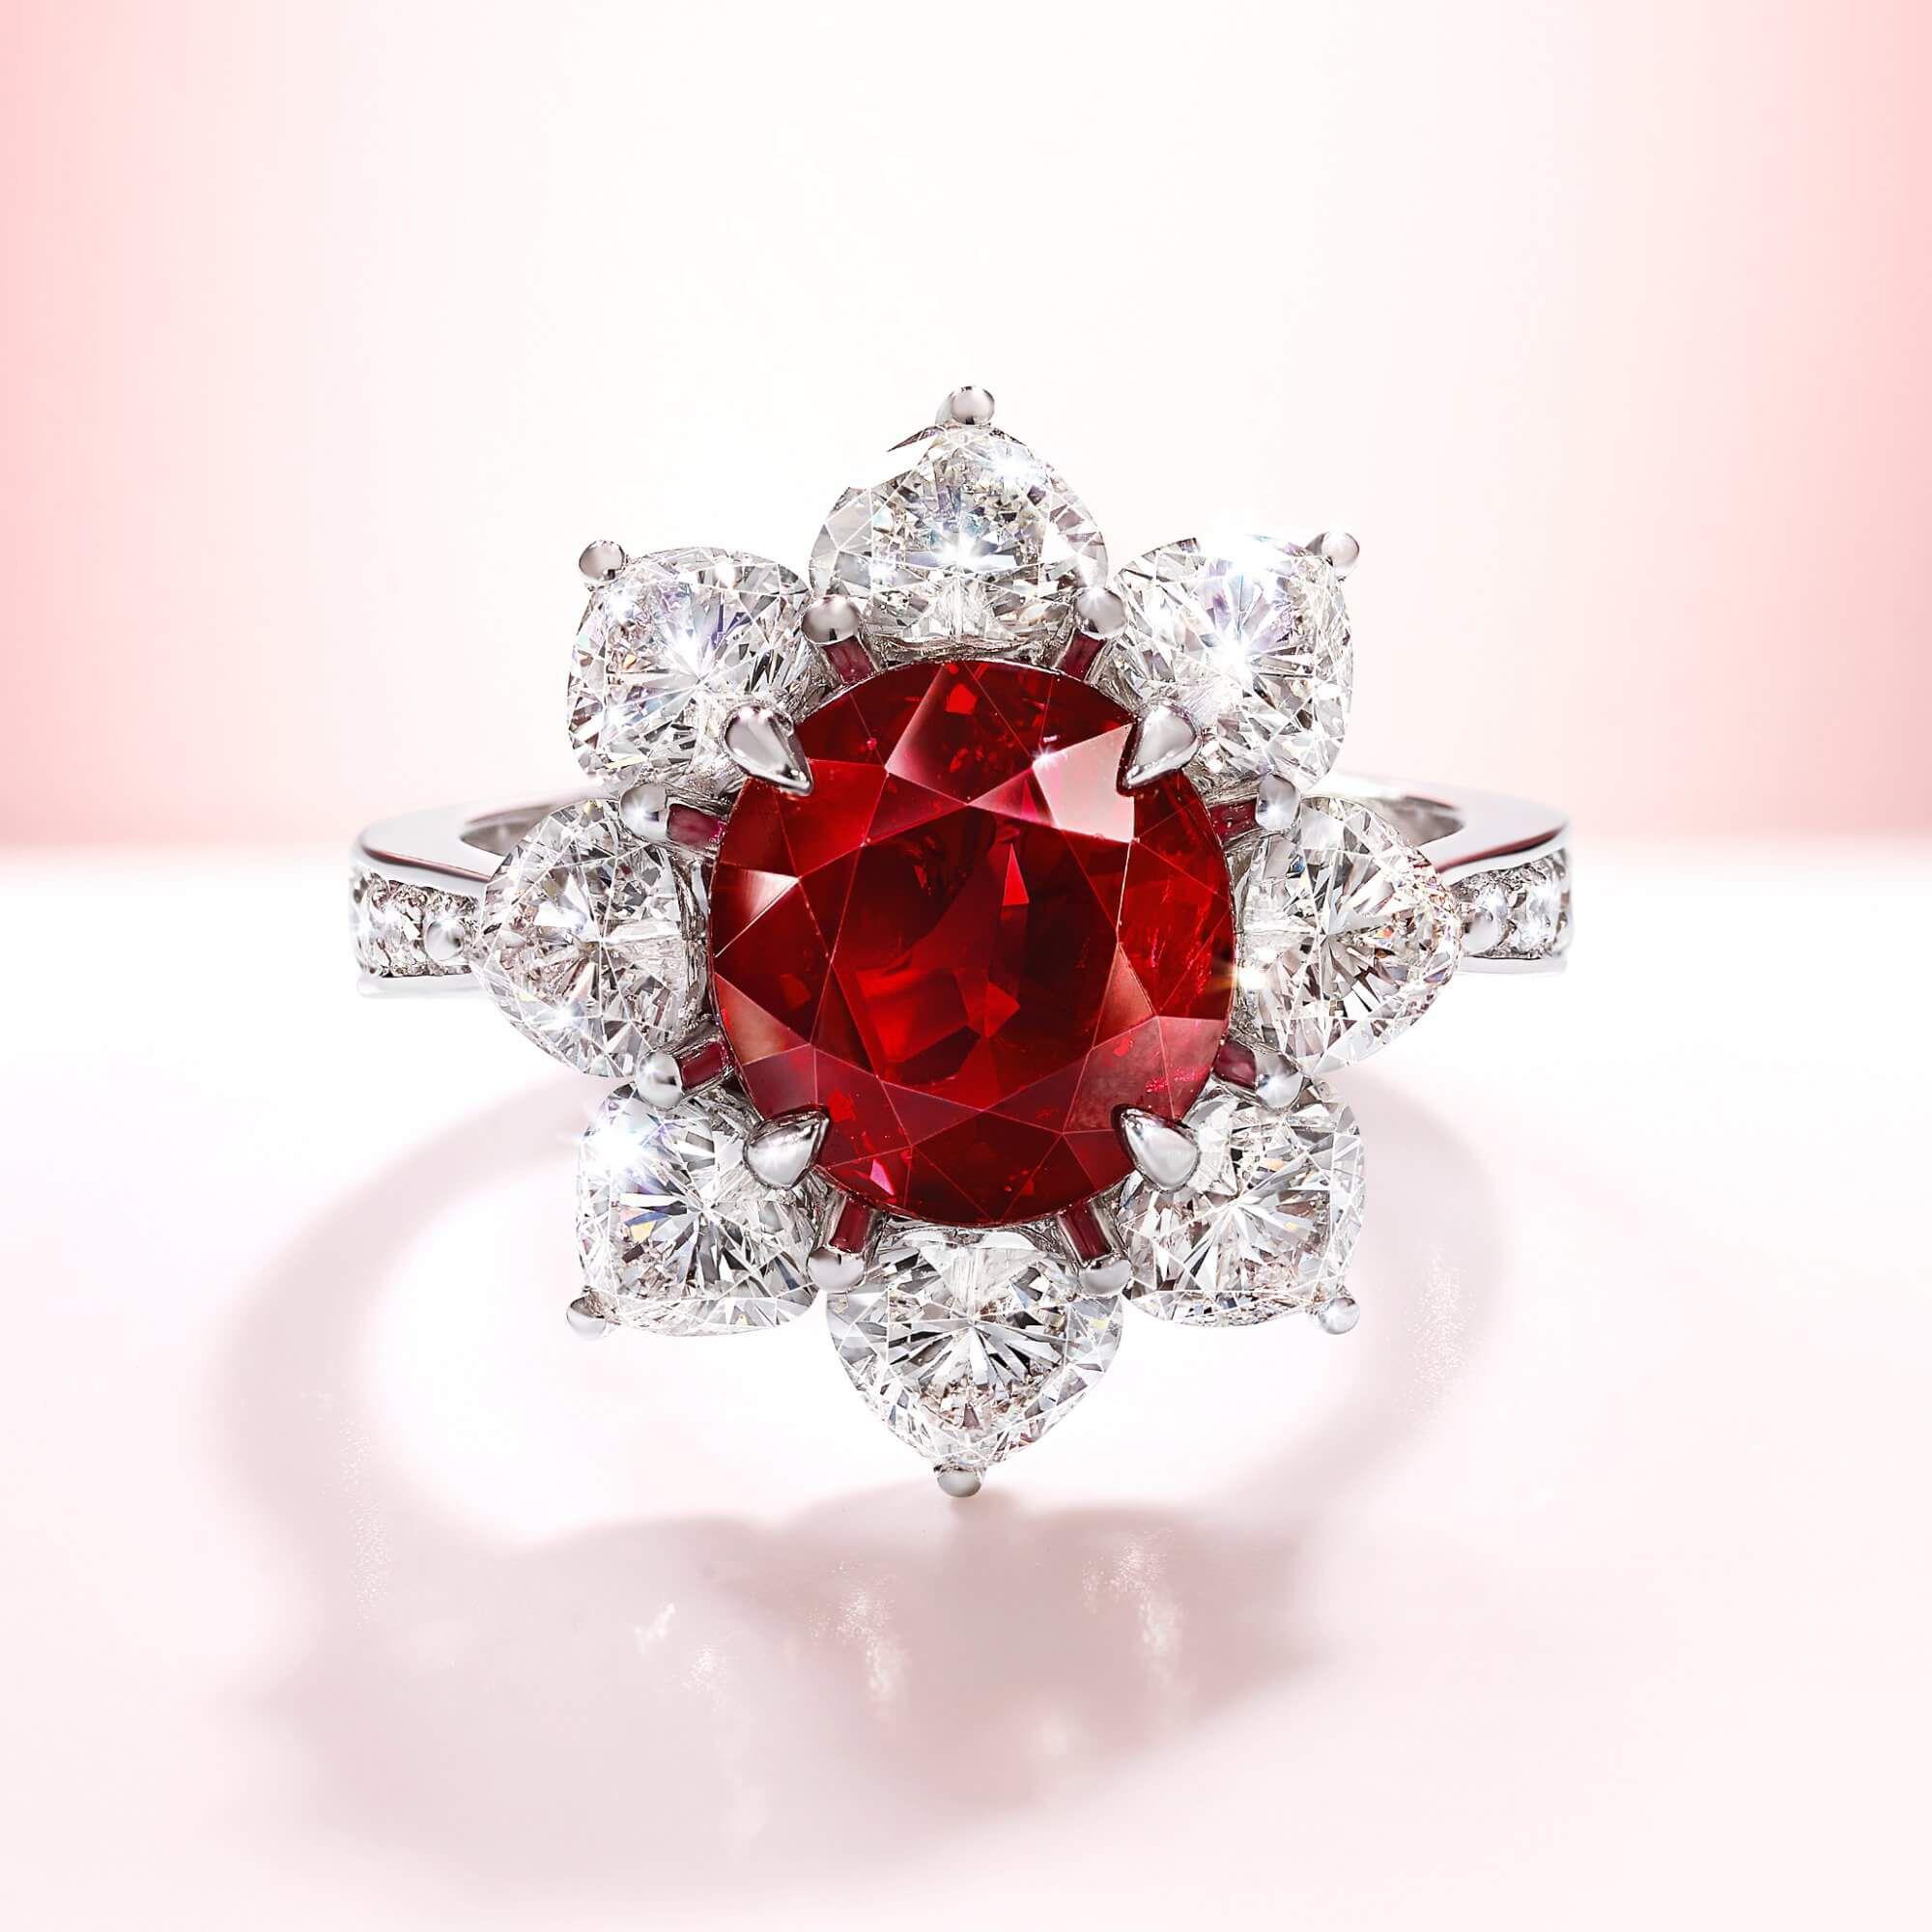 4 ct Oval Burmese Graff Ruby diamond ring - GR46605